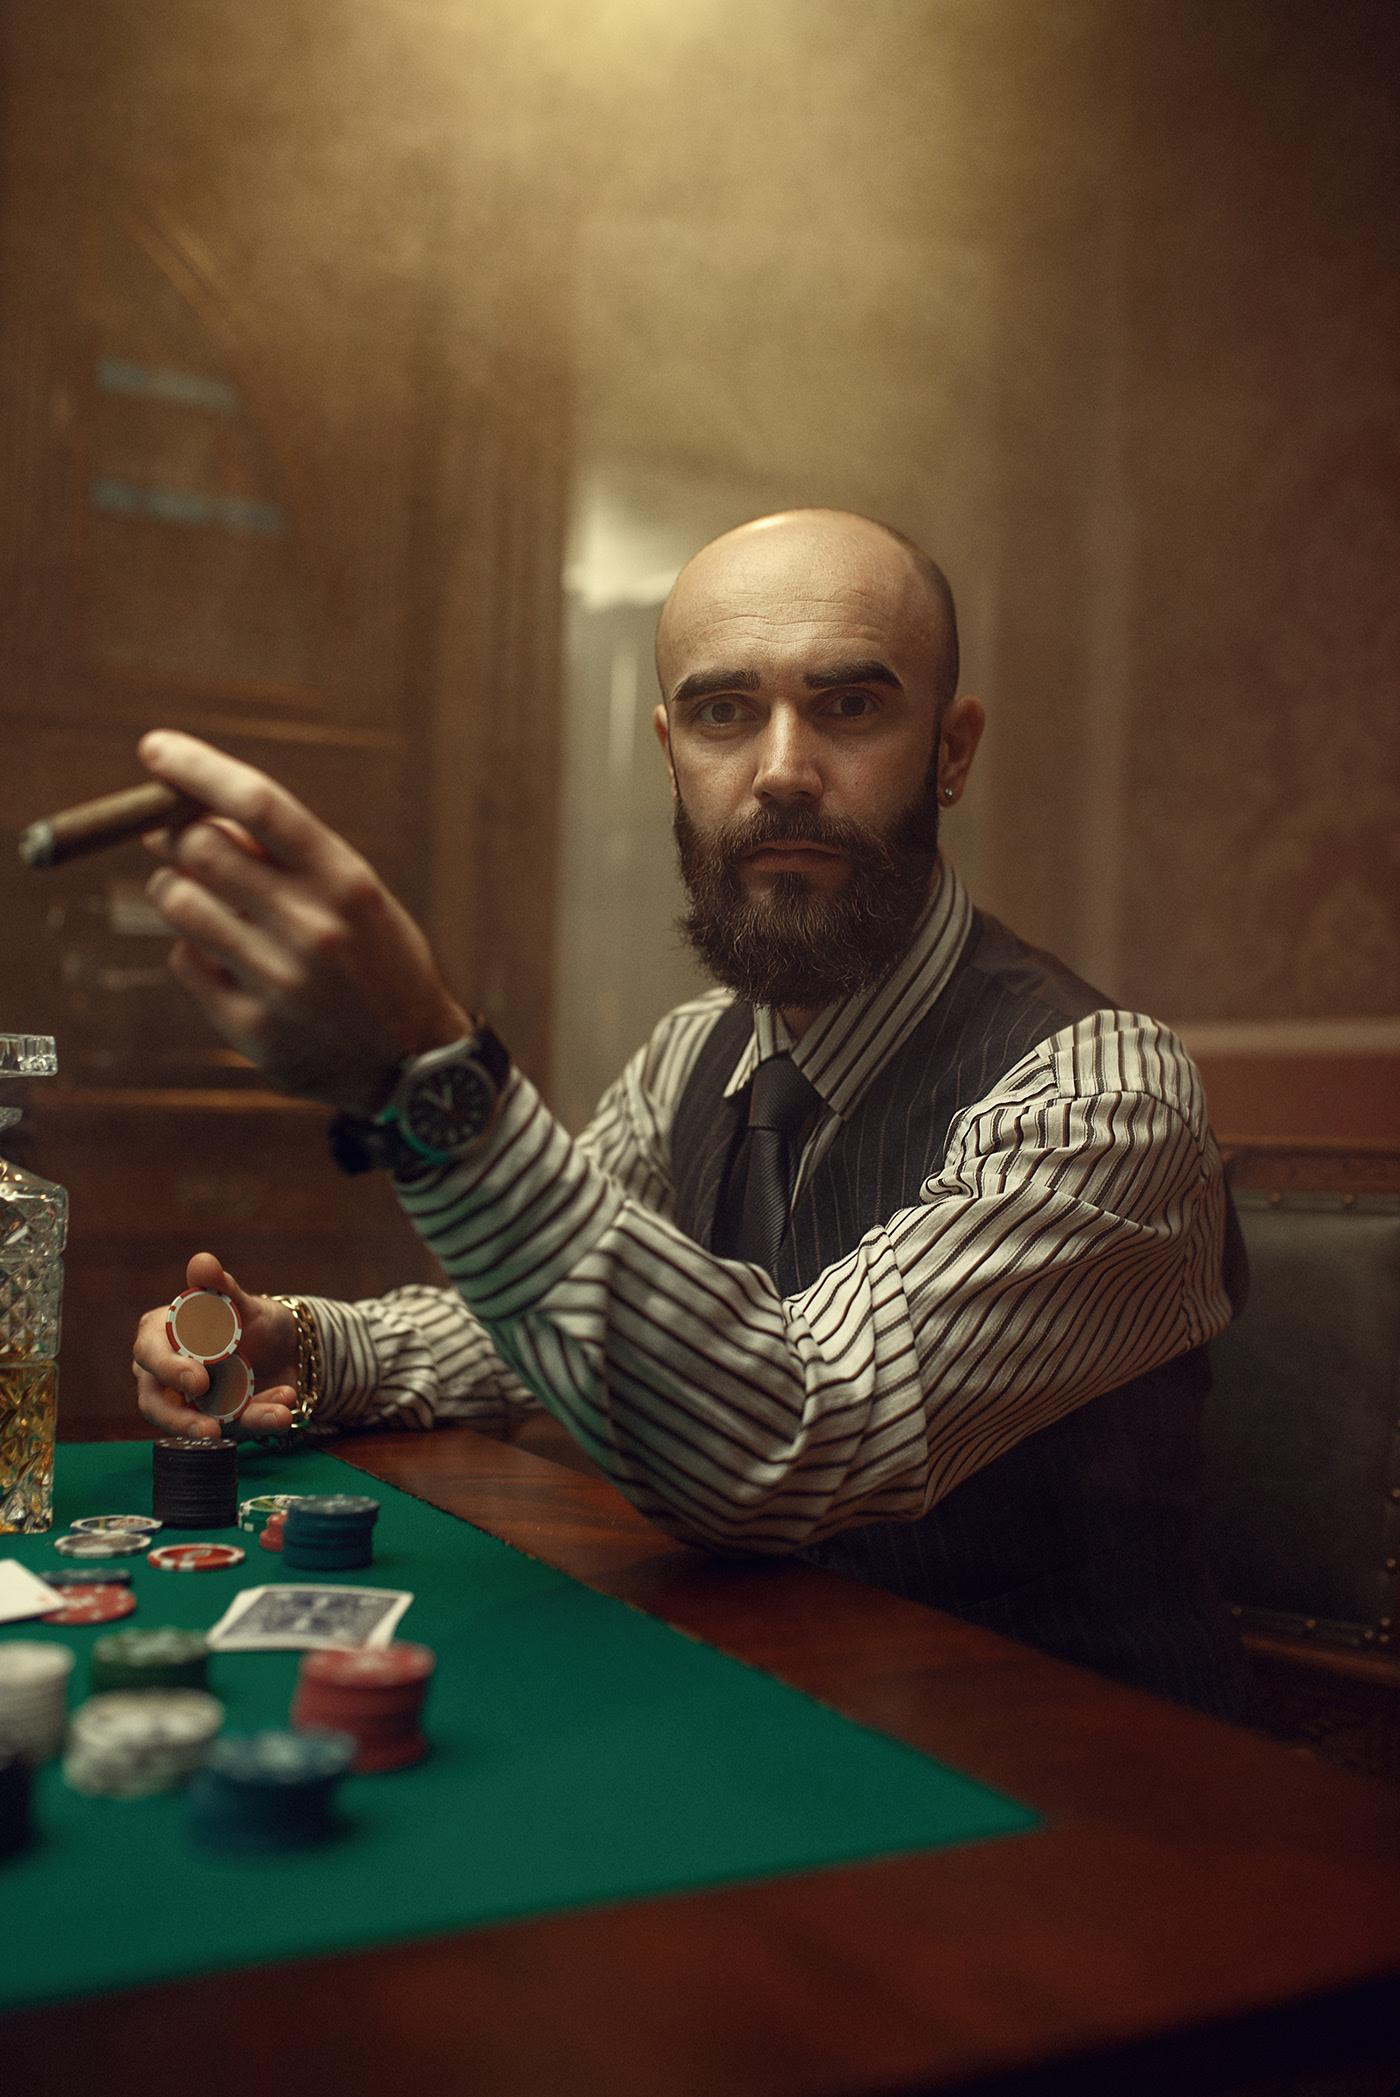 The romance of poker / фотограф Макс Кузин